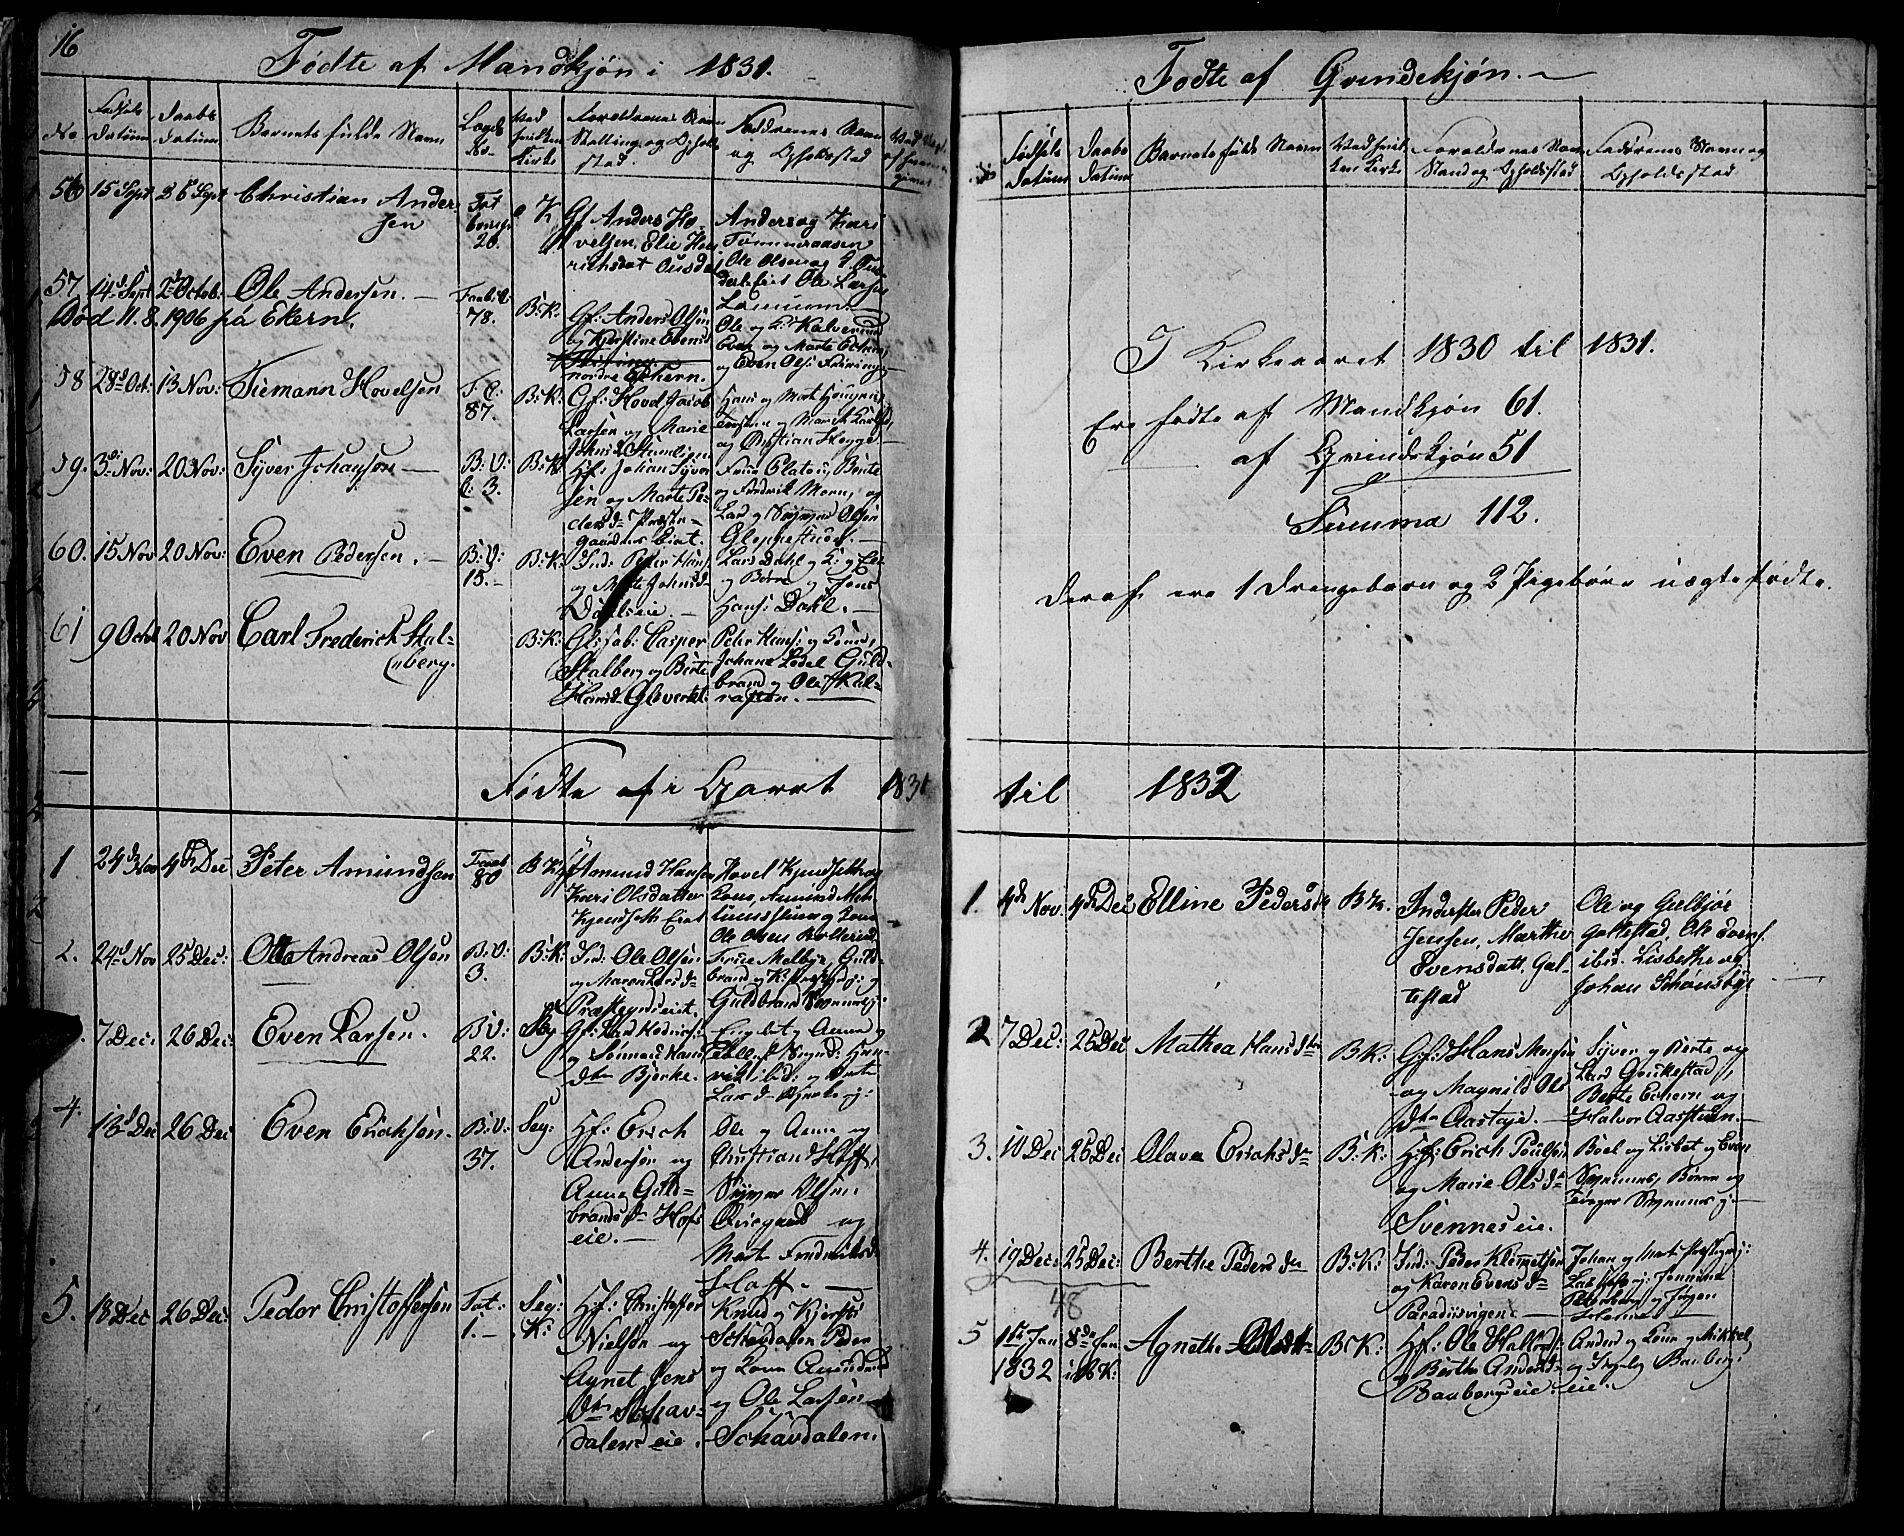 SAH, Biri prestekontor, Ministerialbok nr. 4, 1829-1842, s. 16